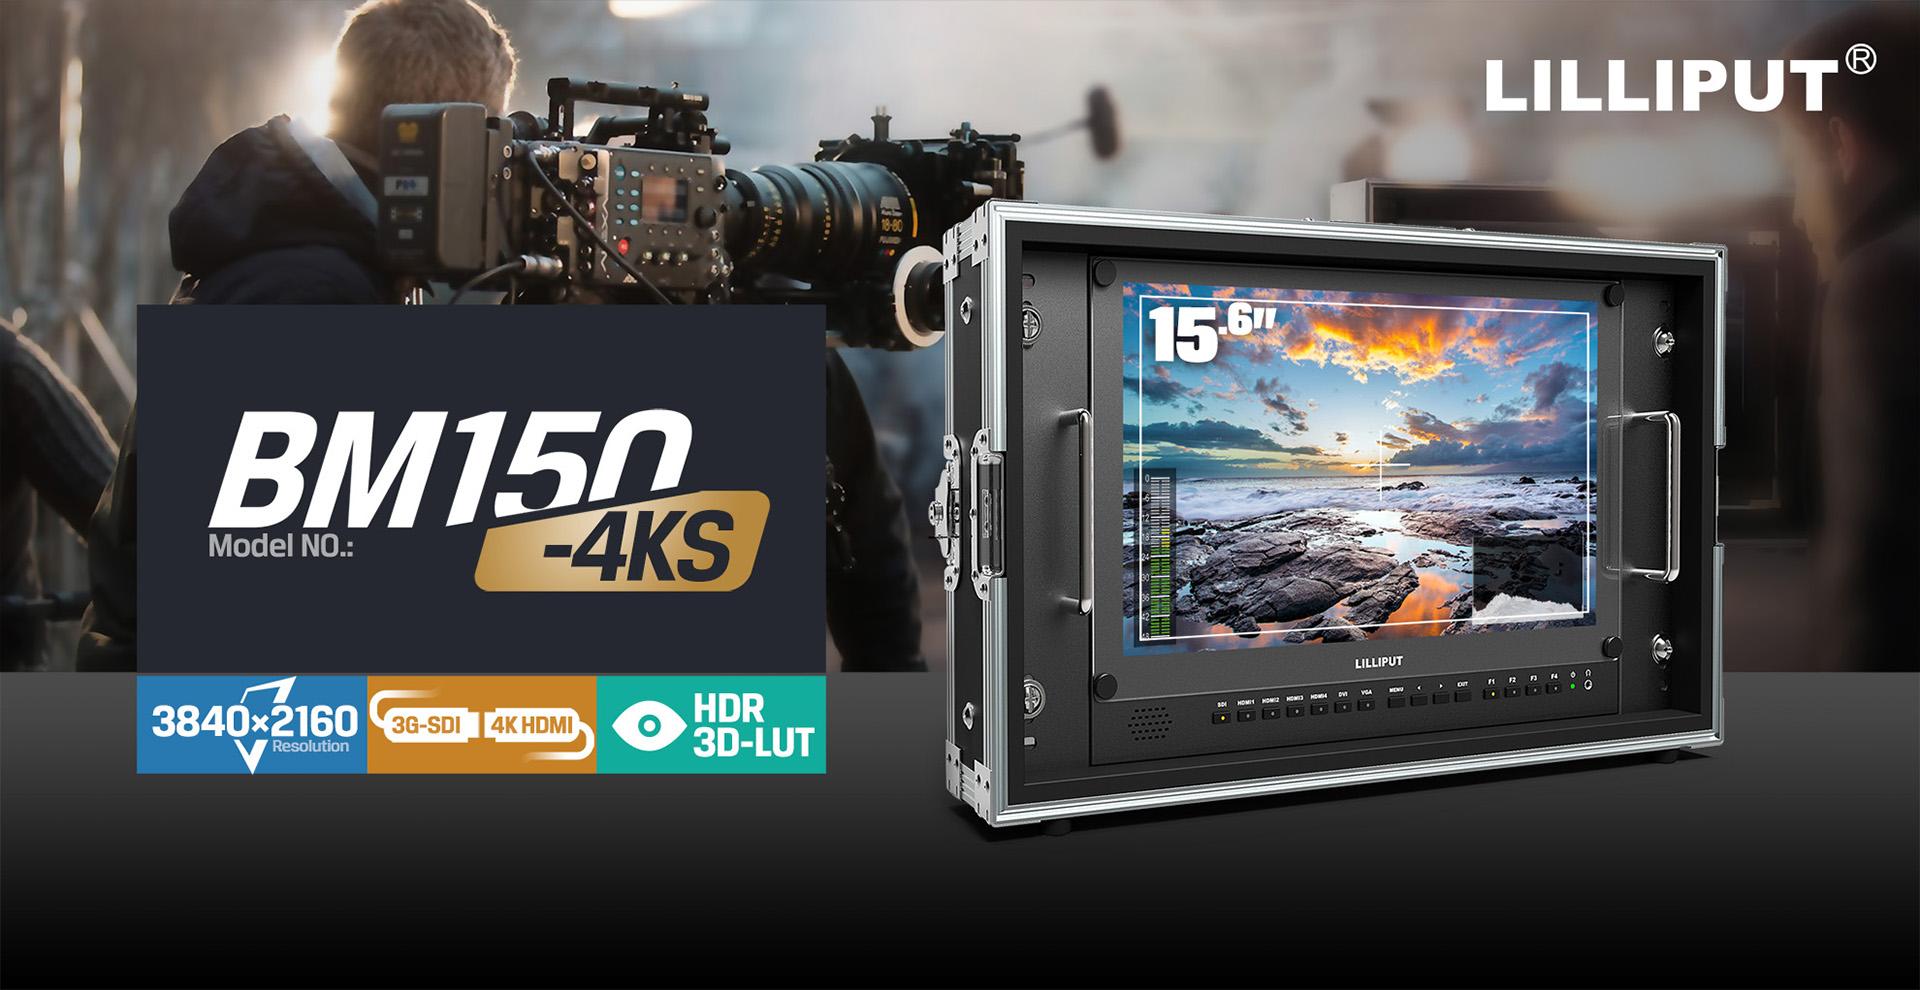 15.6 inch broadcast monitor